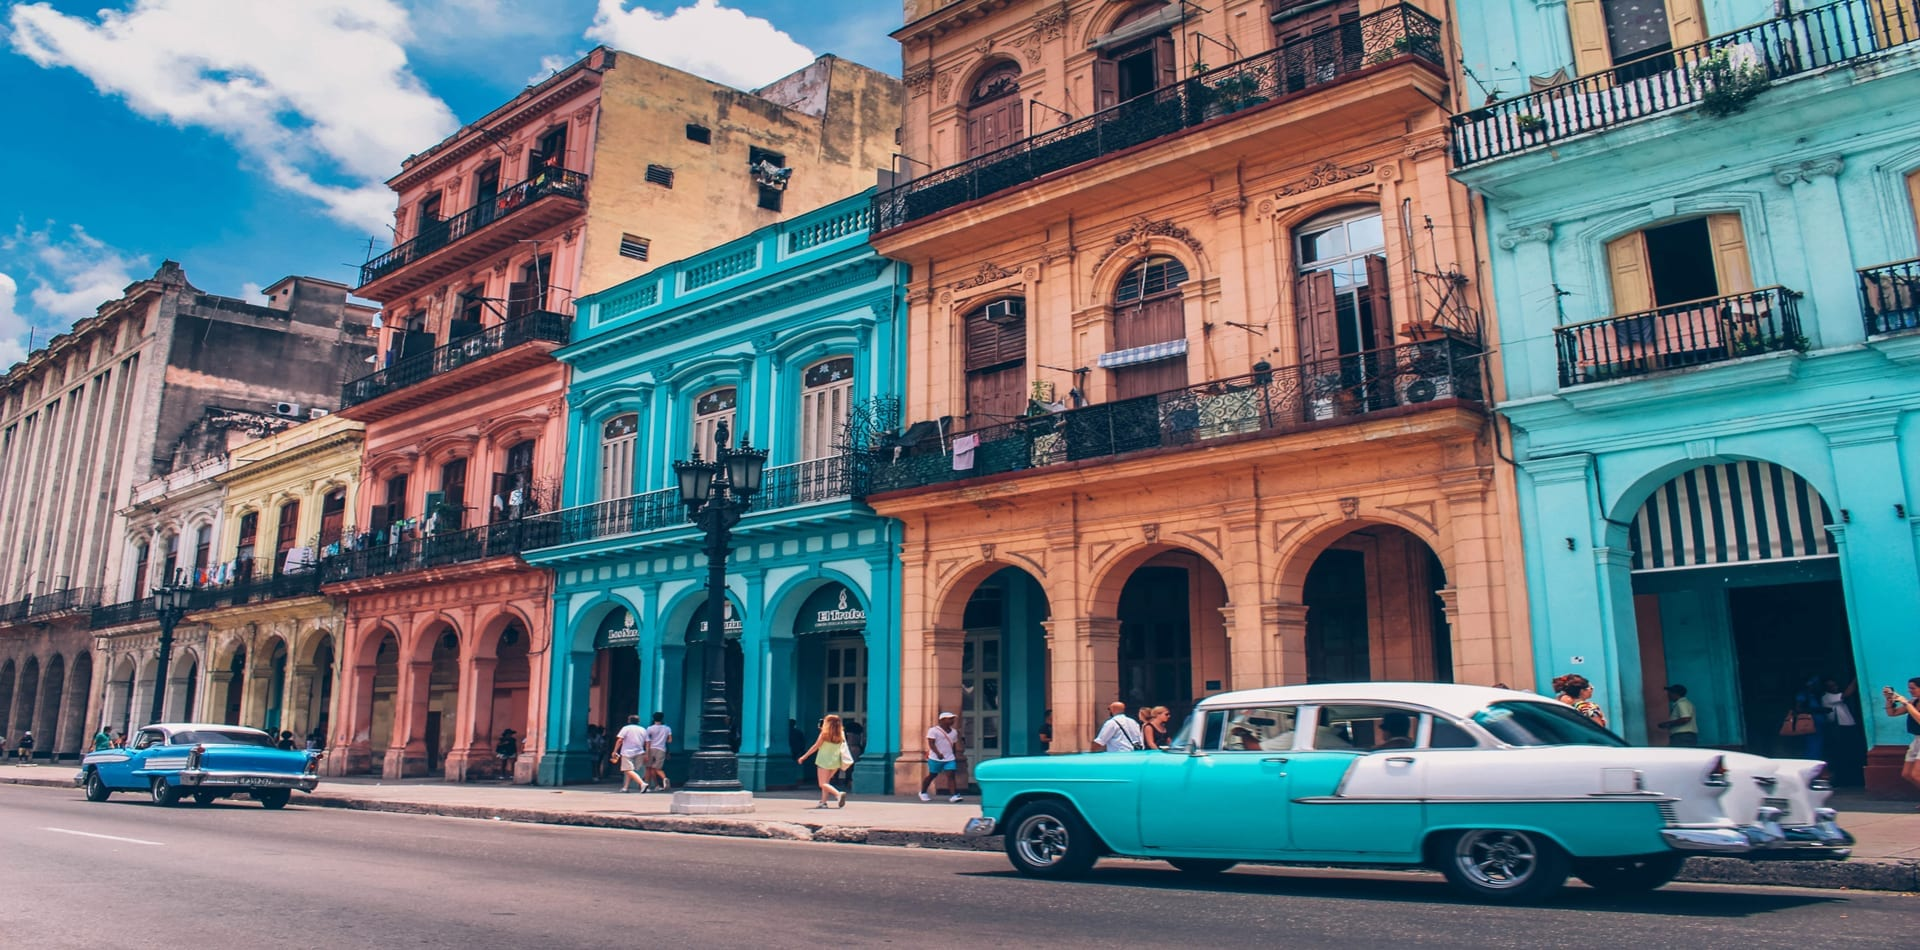 HERO Colourful streets of Cuba